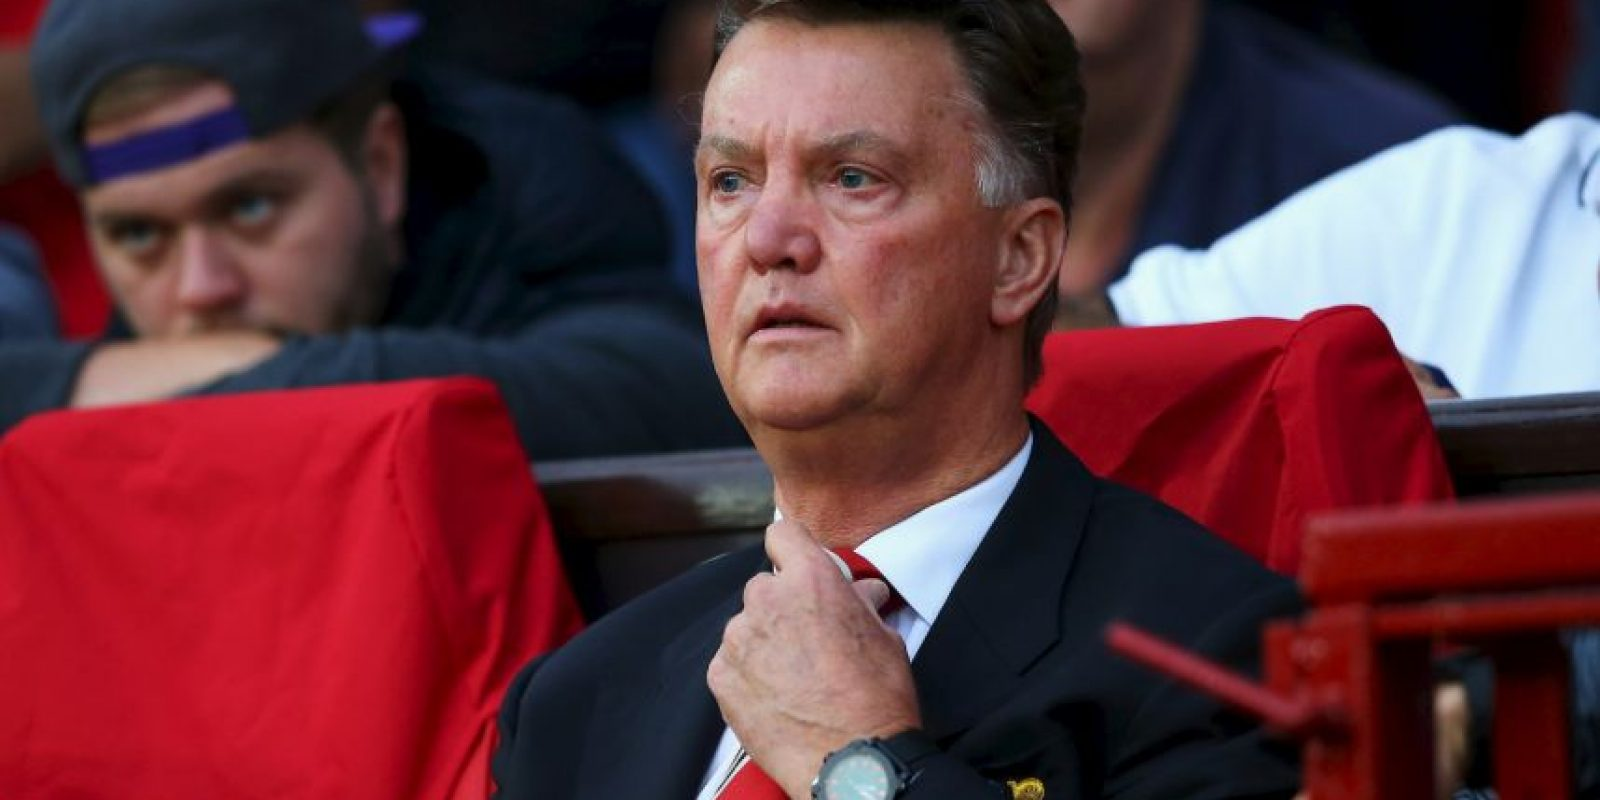 El holandés gana más que estrellas como Juan Mata (9 millones de euros) o David de Gea (5.2 millones de euros). Foto:Getty Images